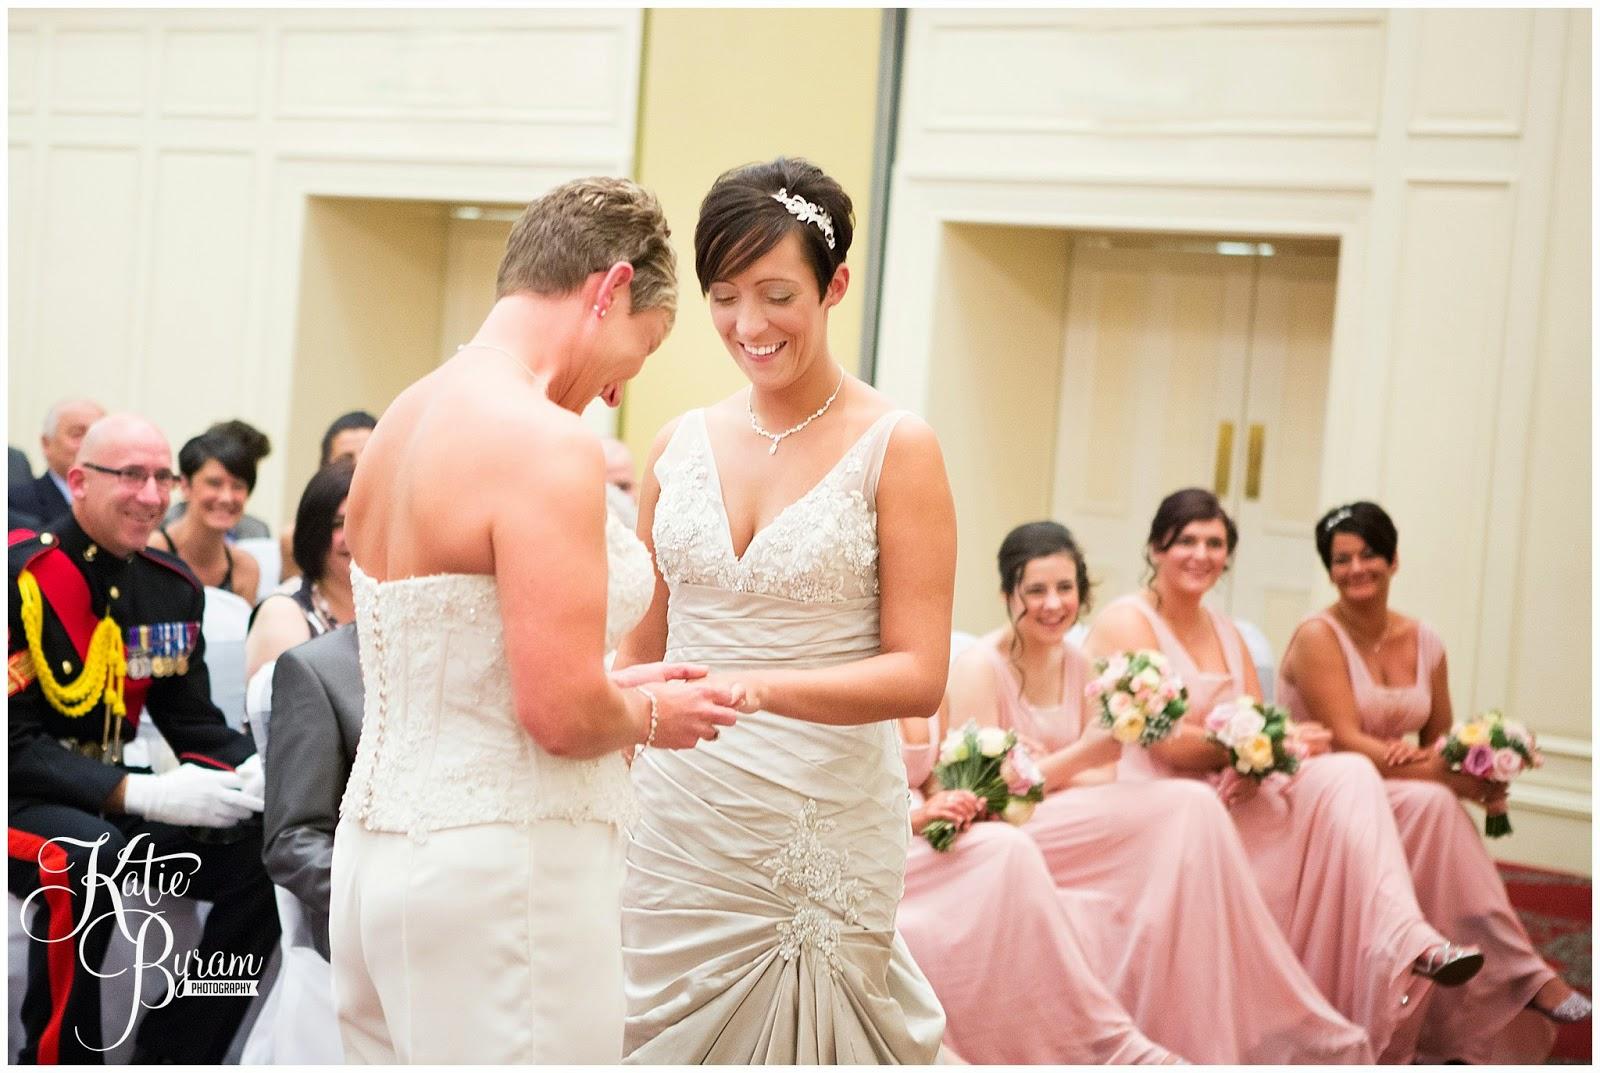 gisborough hall wedding, two brides, gay wedding, lesbian wedding, share the honest love, love my dress blog, katie byram photography